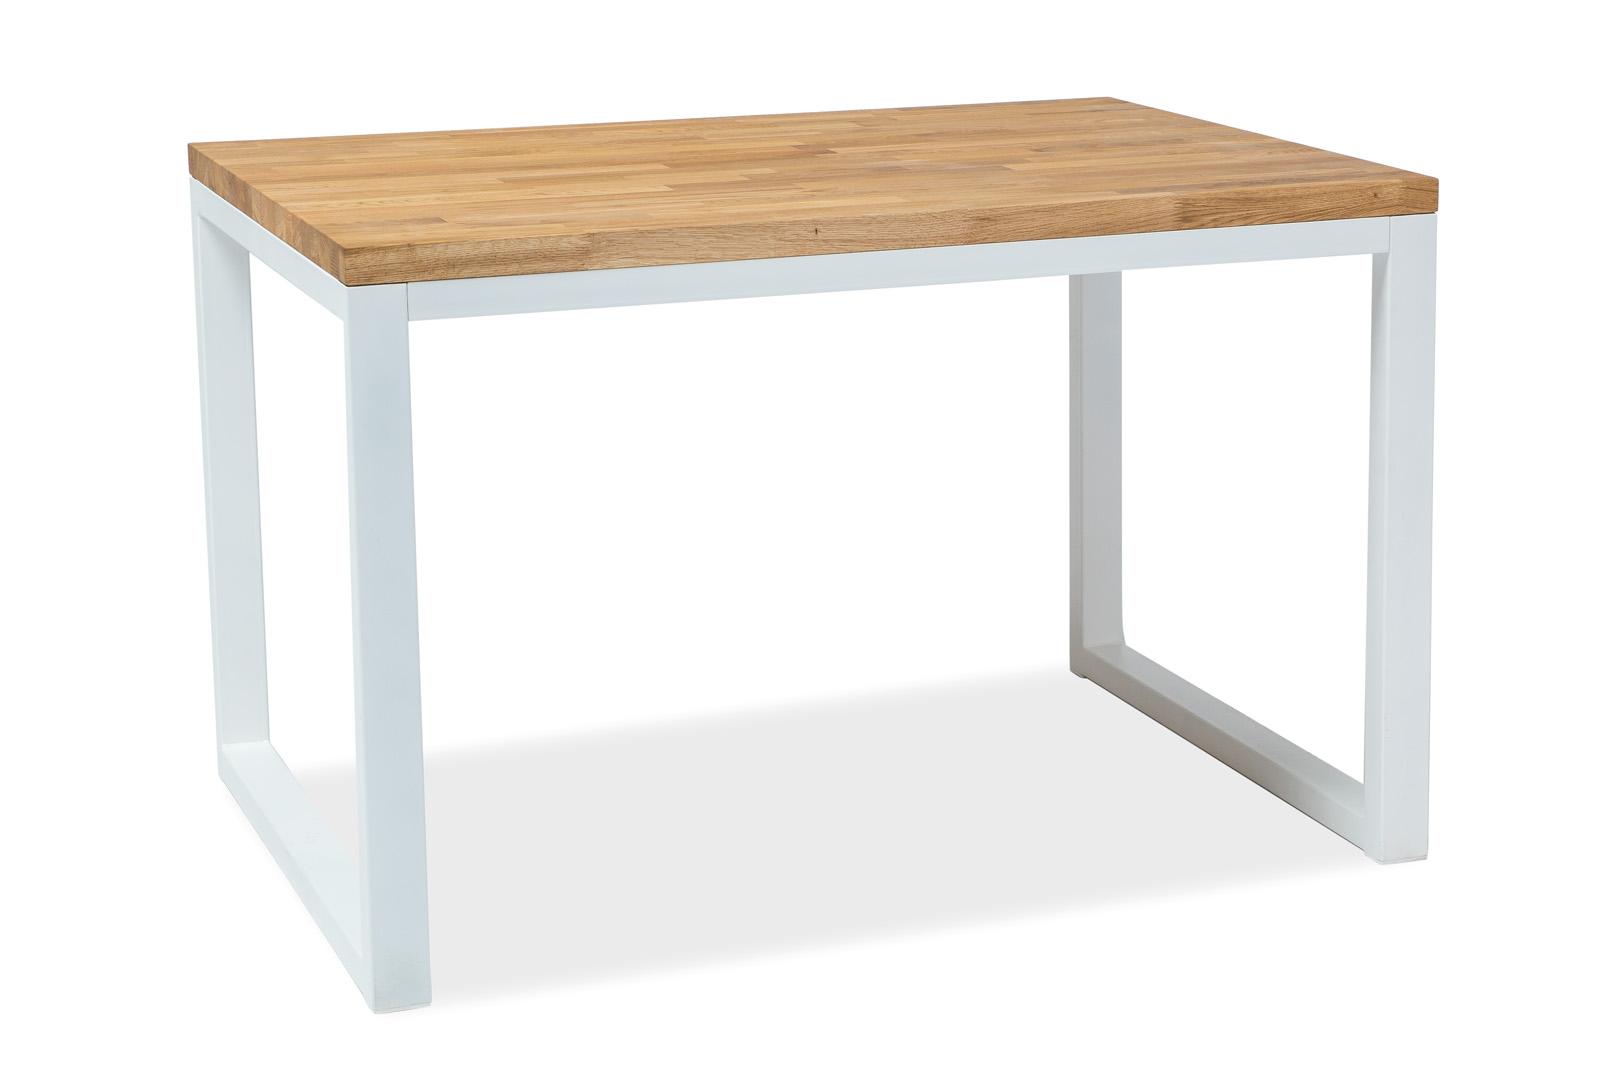 Signal Jedálenský stôl Loras II Prevedenie: Biela - 77 x 90 x 150 cm